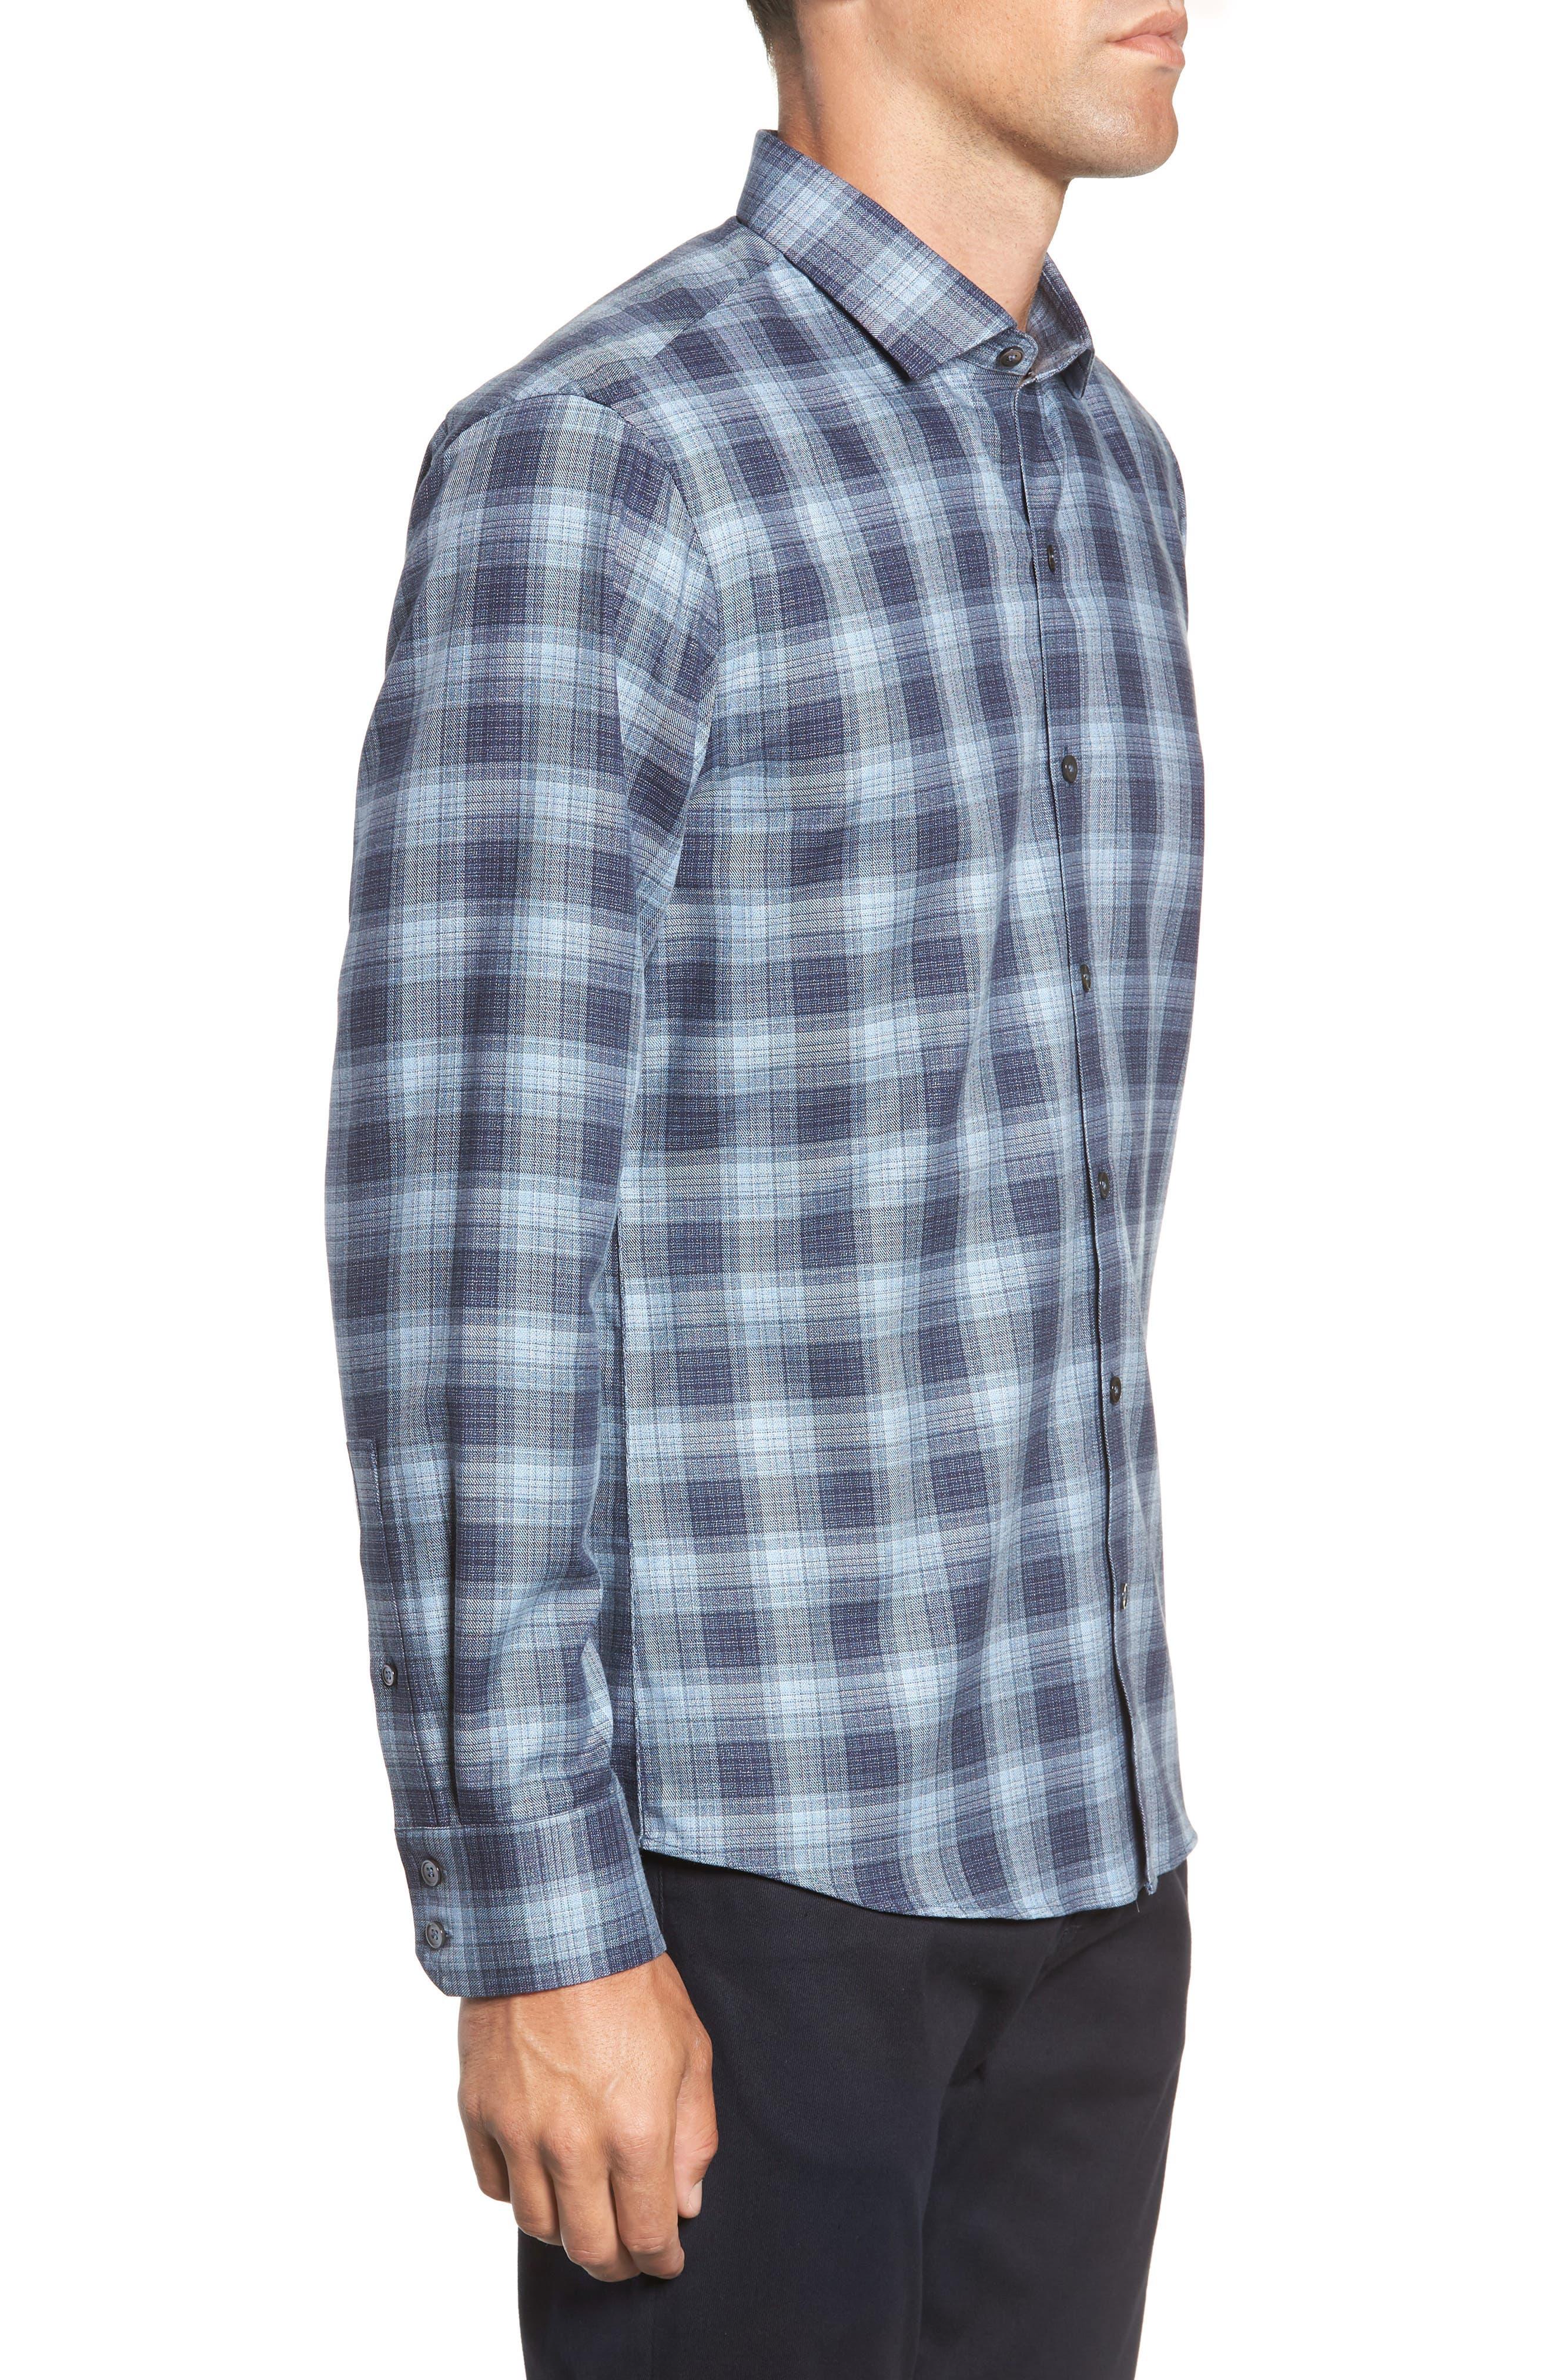 Oris Regular Fit Check Sport Shirt,                             Alternate thumbnail 4, color,                             BLUE